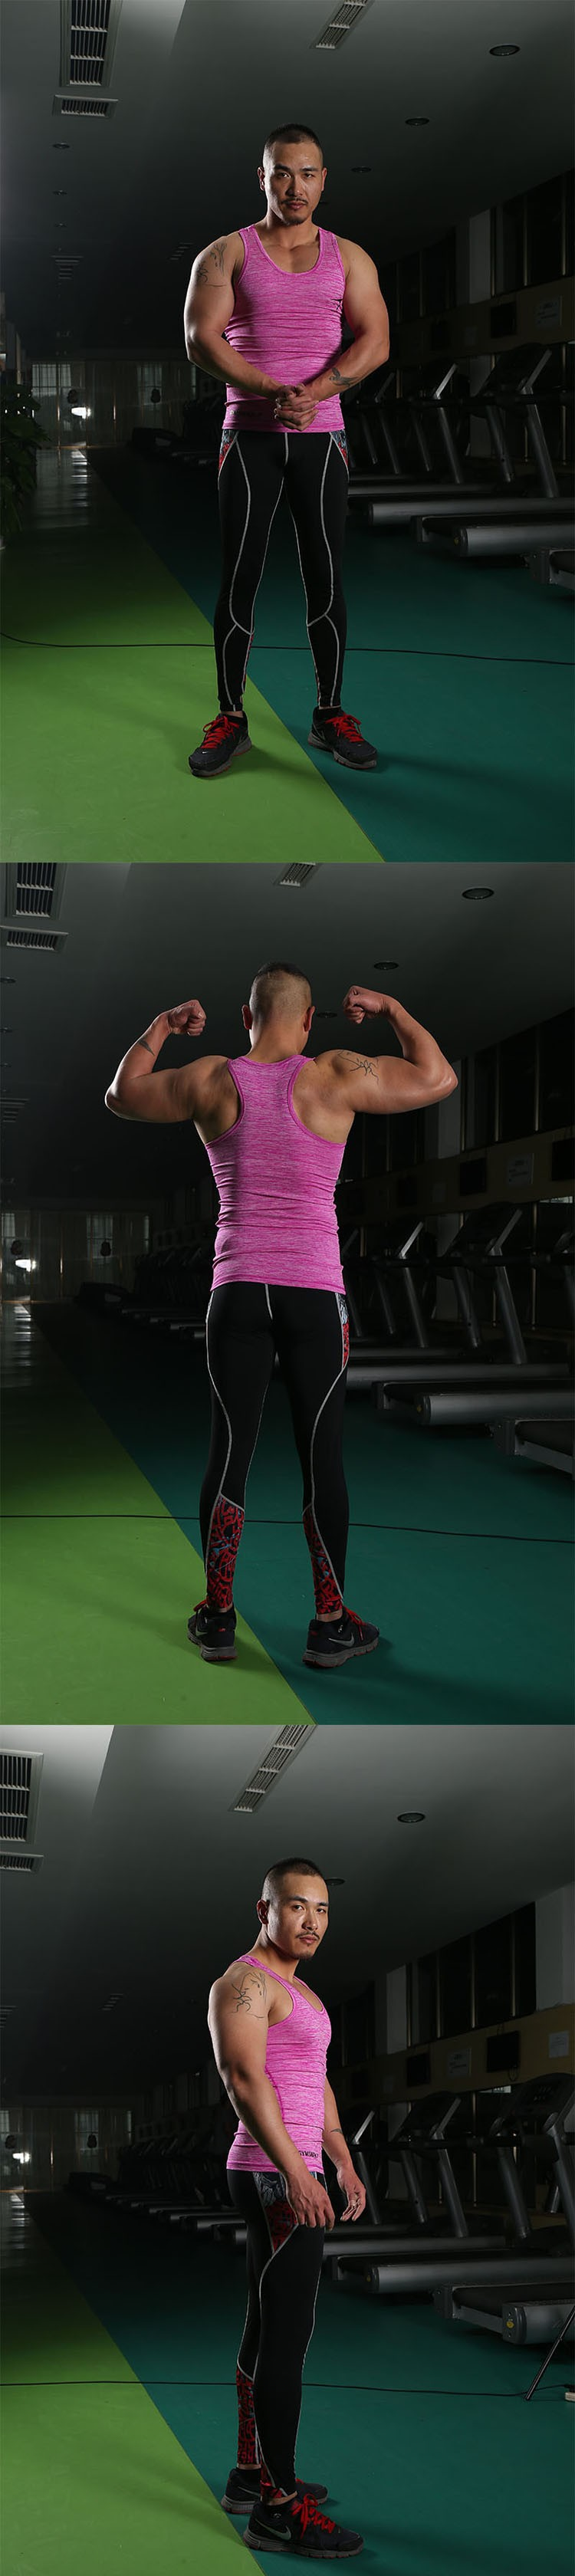 Gym Tank Tops Men Undershirt Sports Wear GymShark Singlet Bodybuilding Basketball Fitness Training Tight Vest Sleeveless Shirt (3)